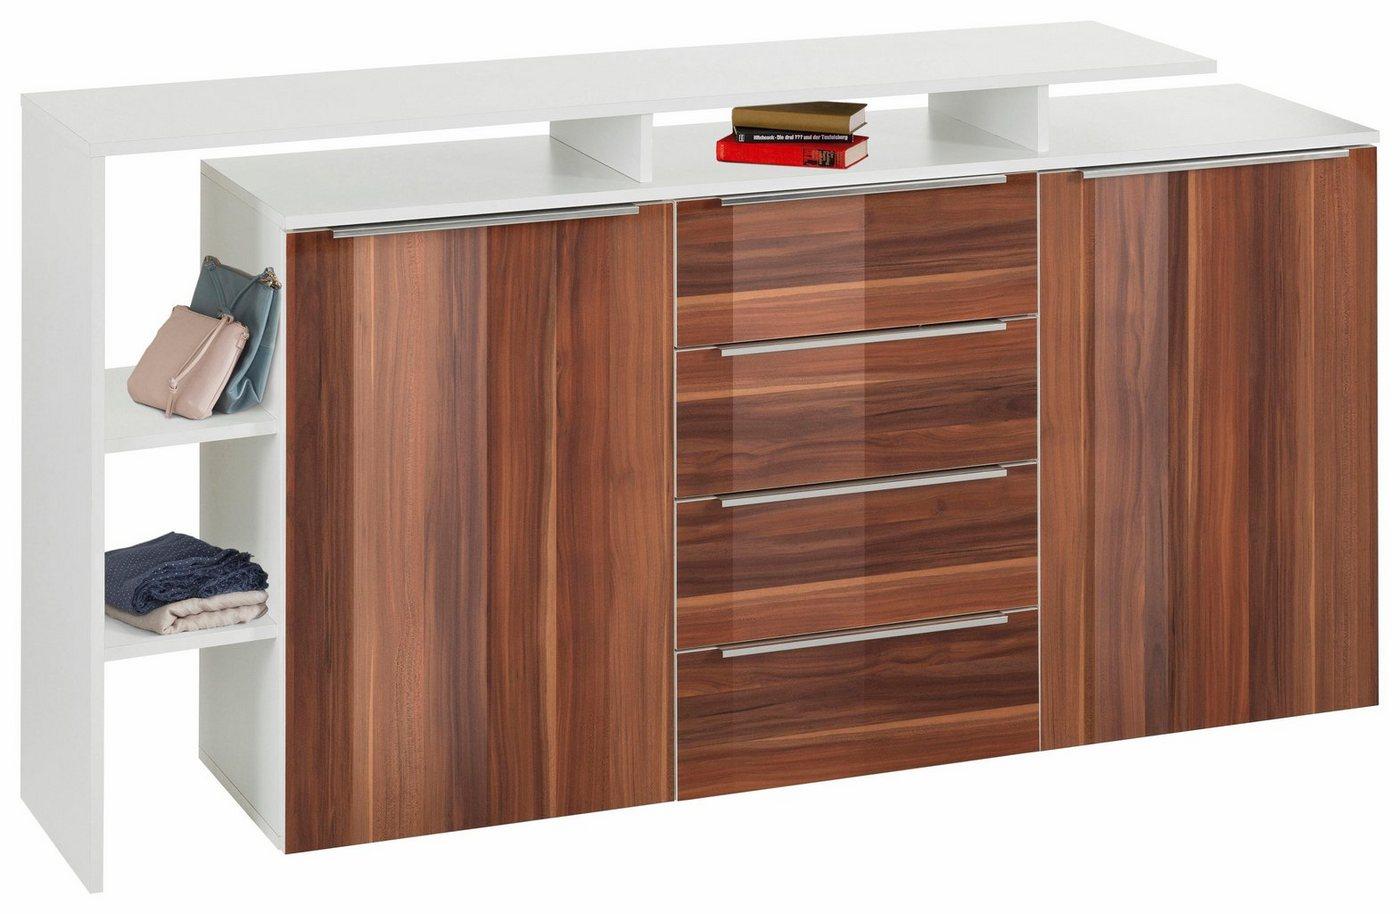 sideboard bei otto mbel bei otto versand stunning otto versand kommoden great best of with. Black Bedroom Furniture Sets. Home Design Ideas